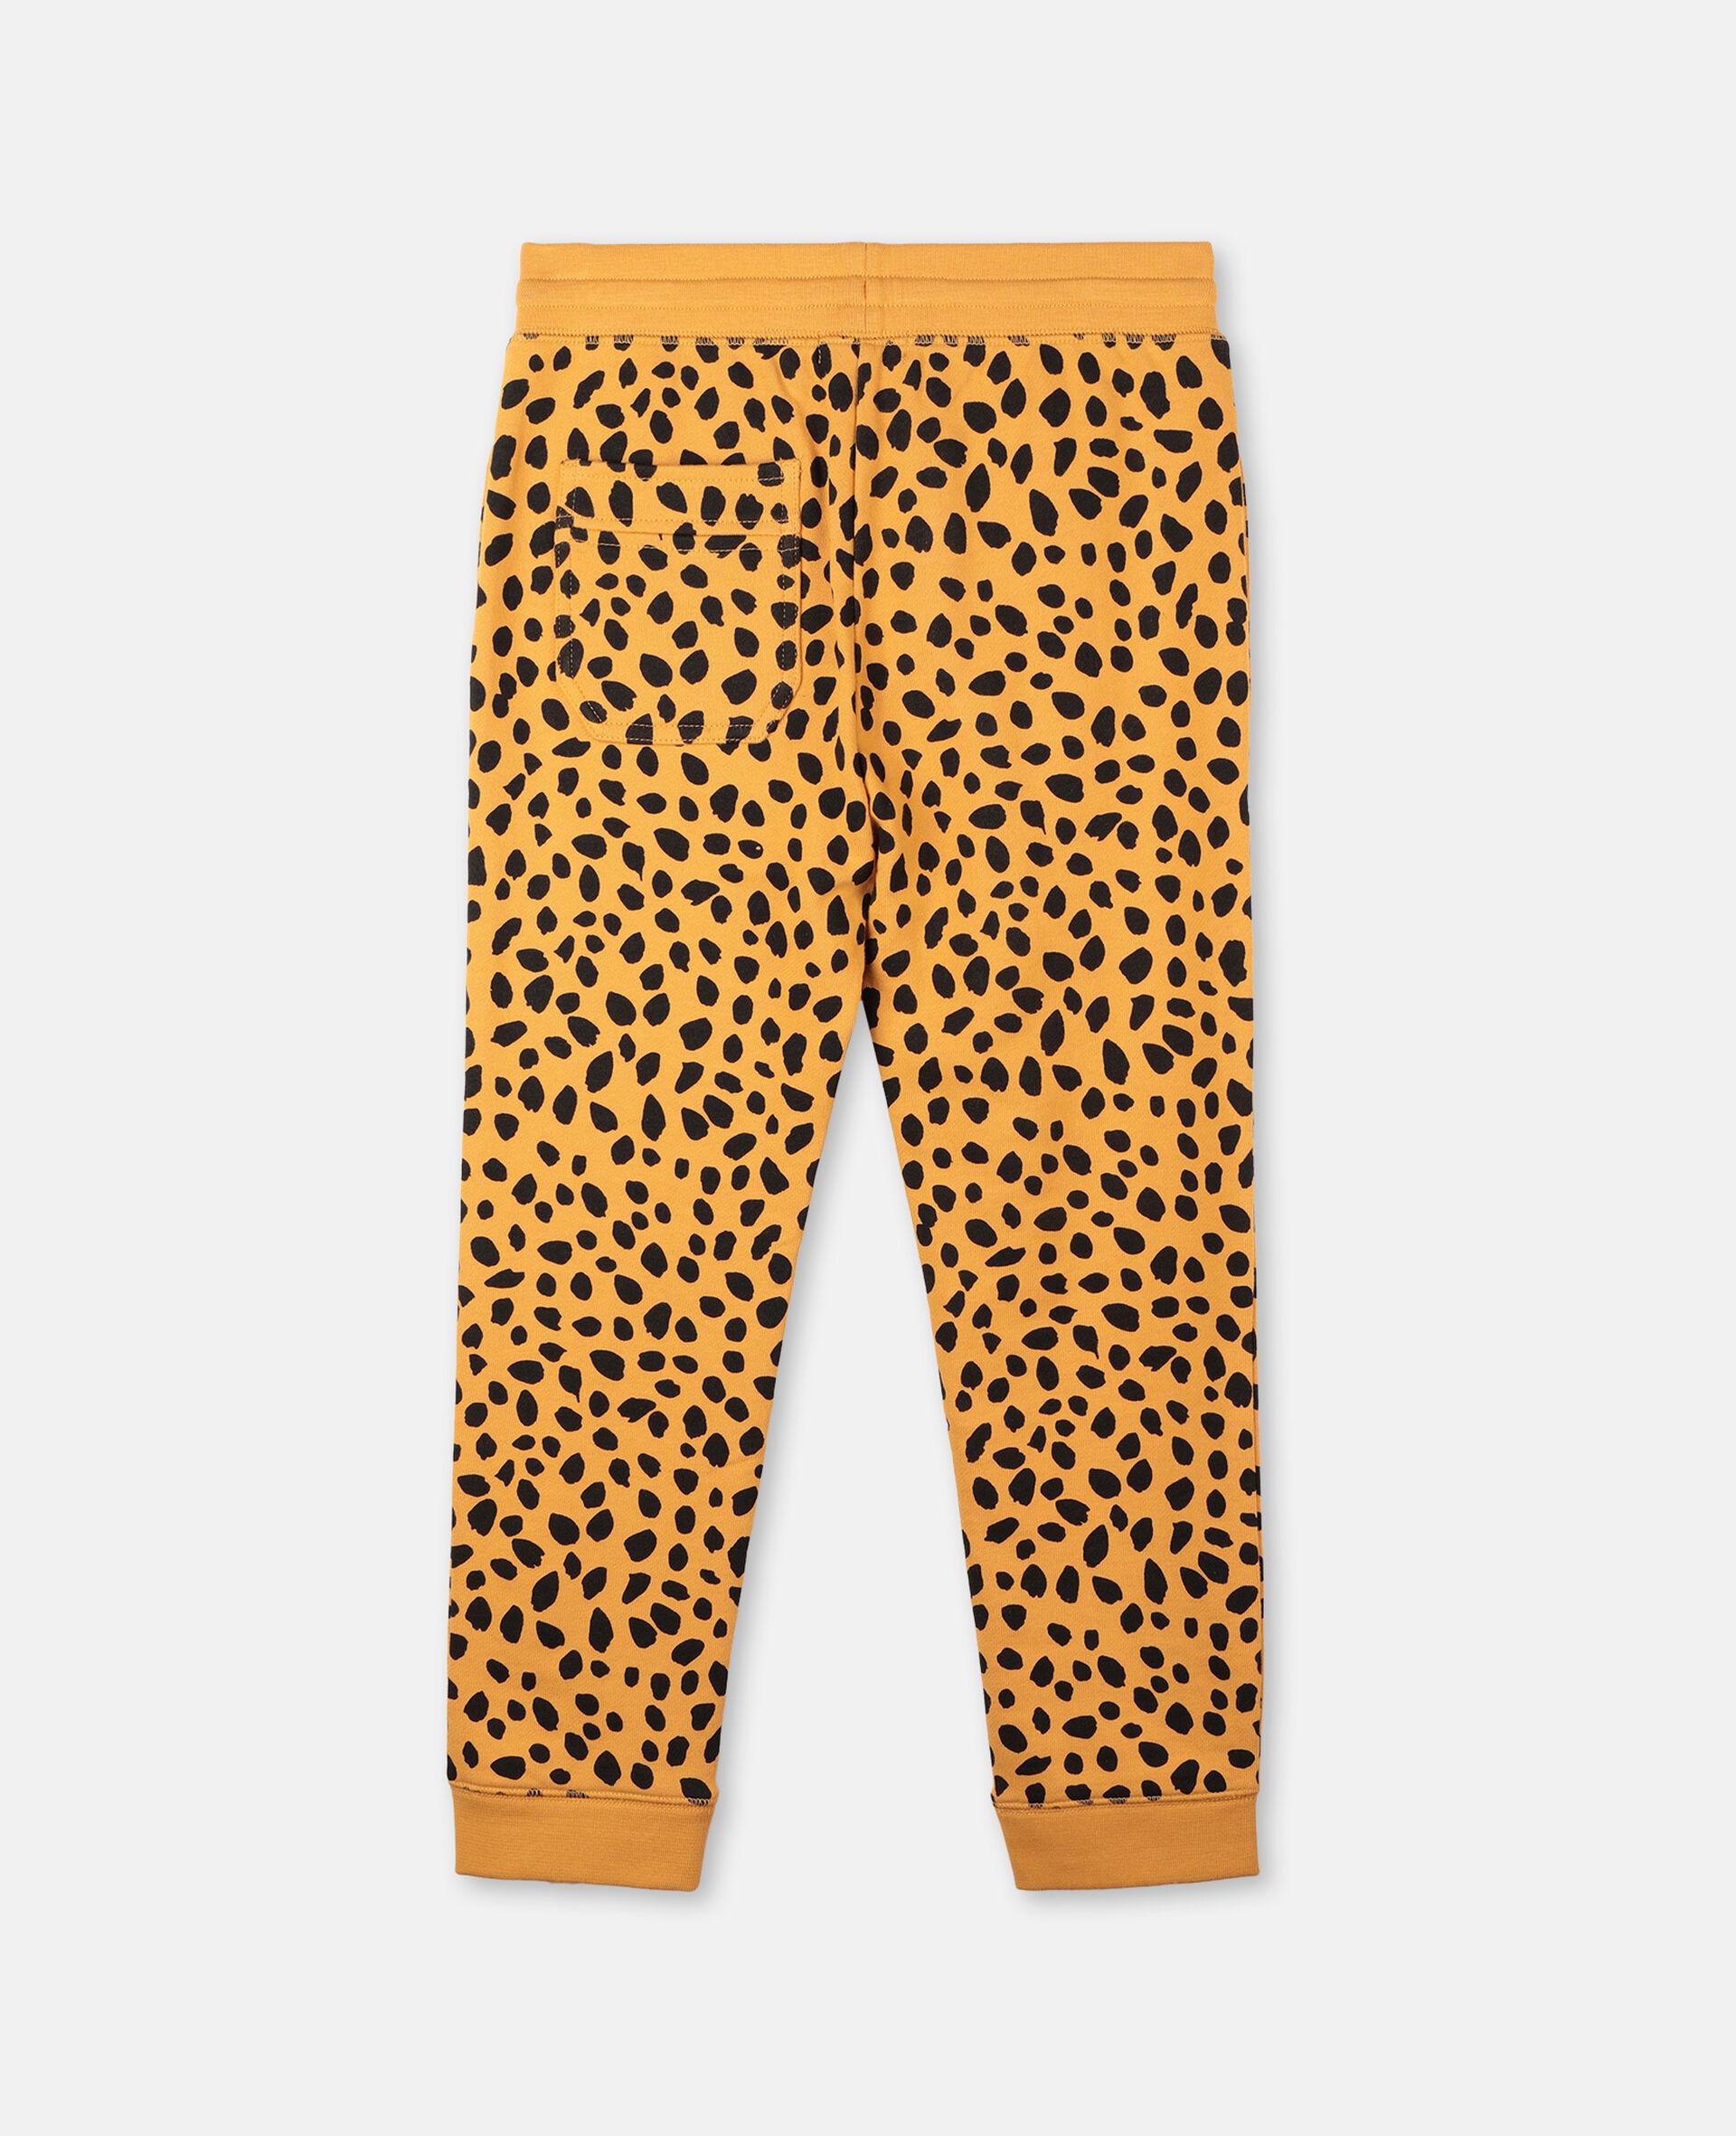 Cheetah Dots Cotton Joggers  -Multicolour-large image number 3